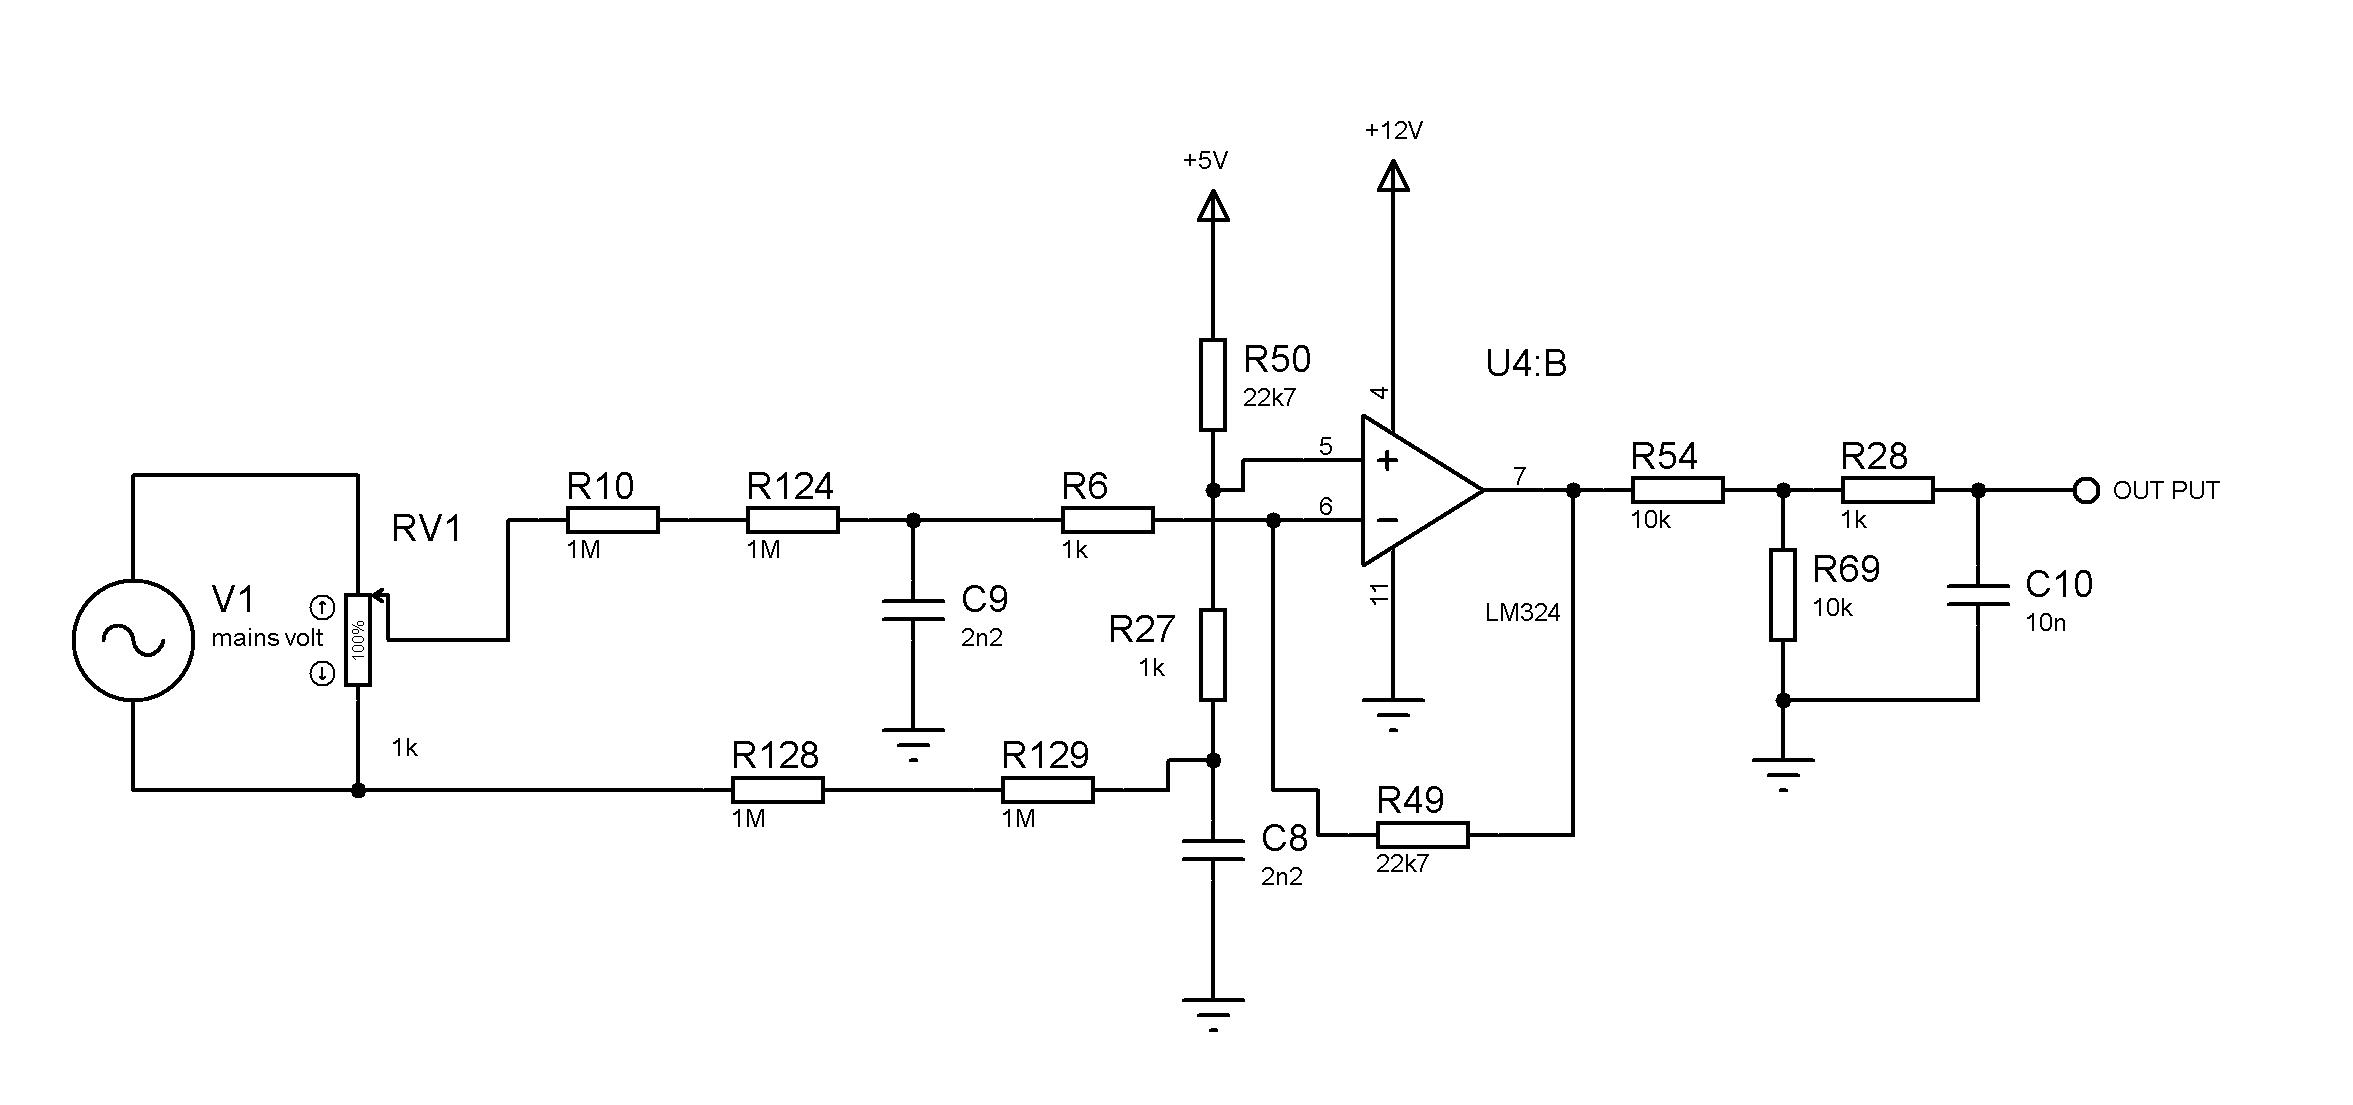 mains volt sensing amplifier problem using lm324 - General ...